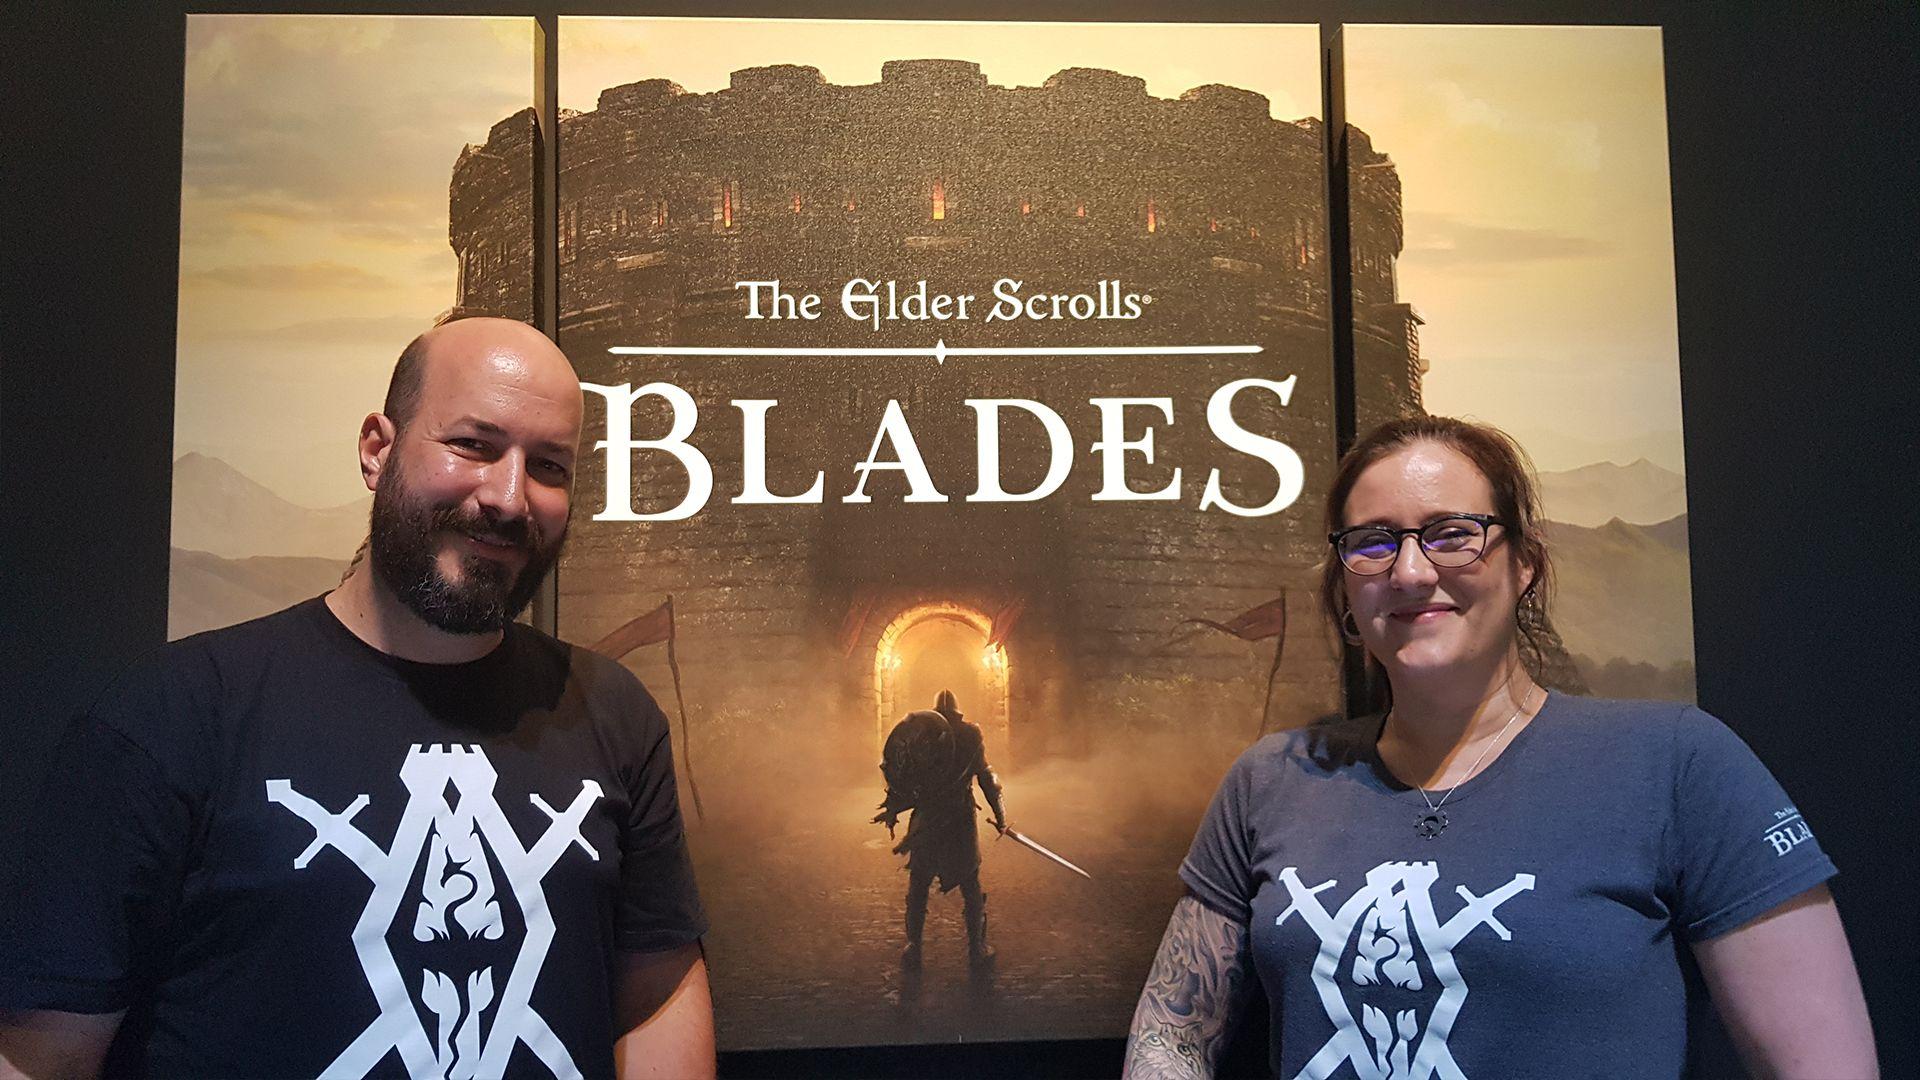 The Elder Scrolls: Blades, intervista a Matt Carofano e Veronique Bruneau